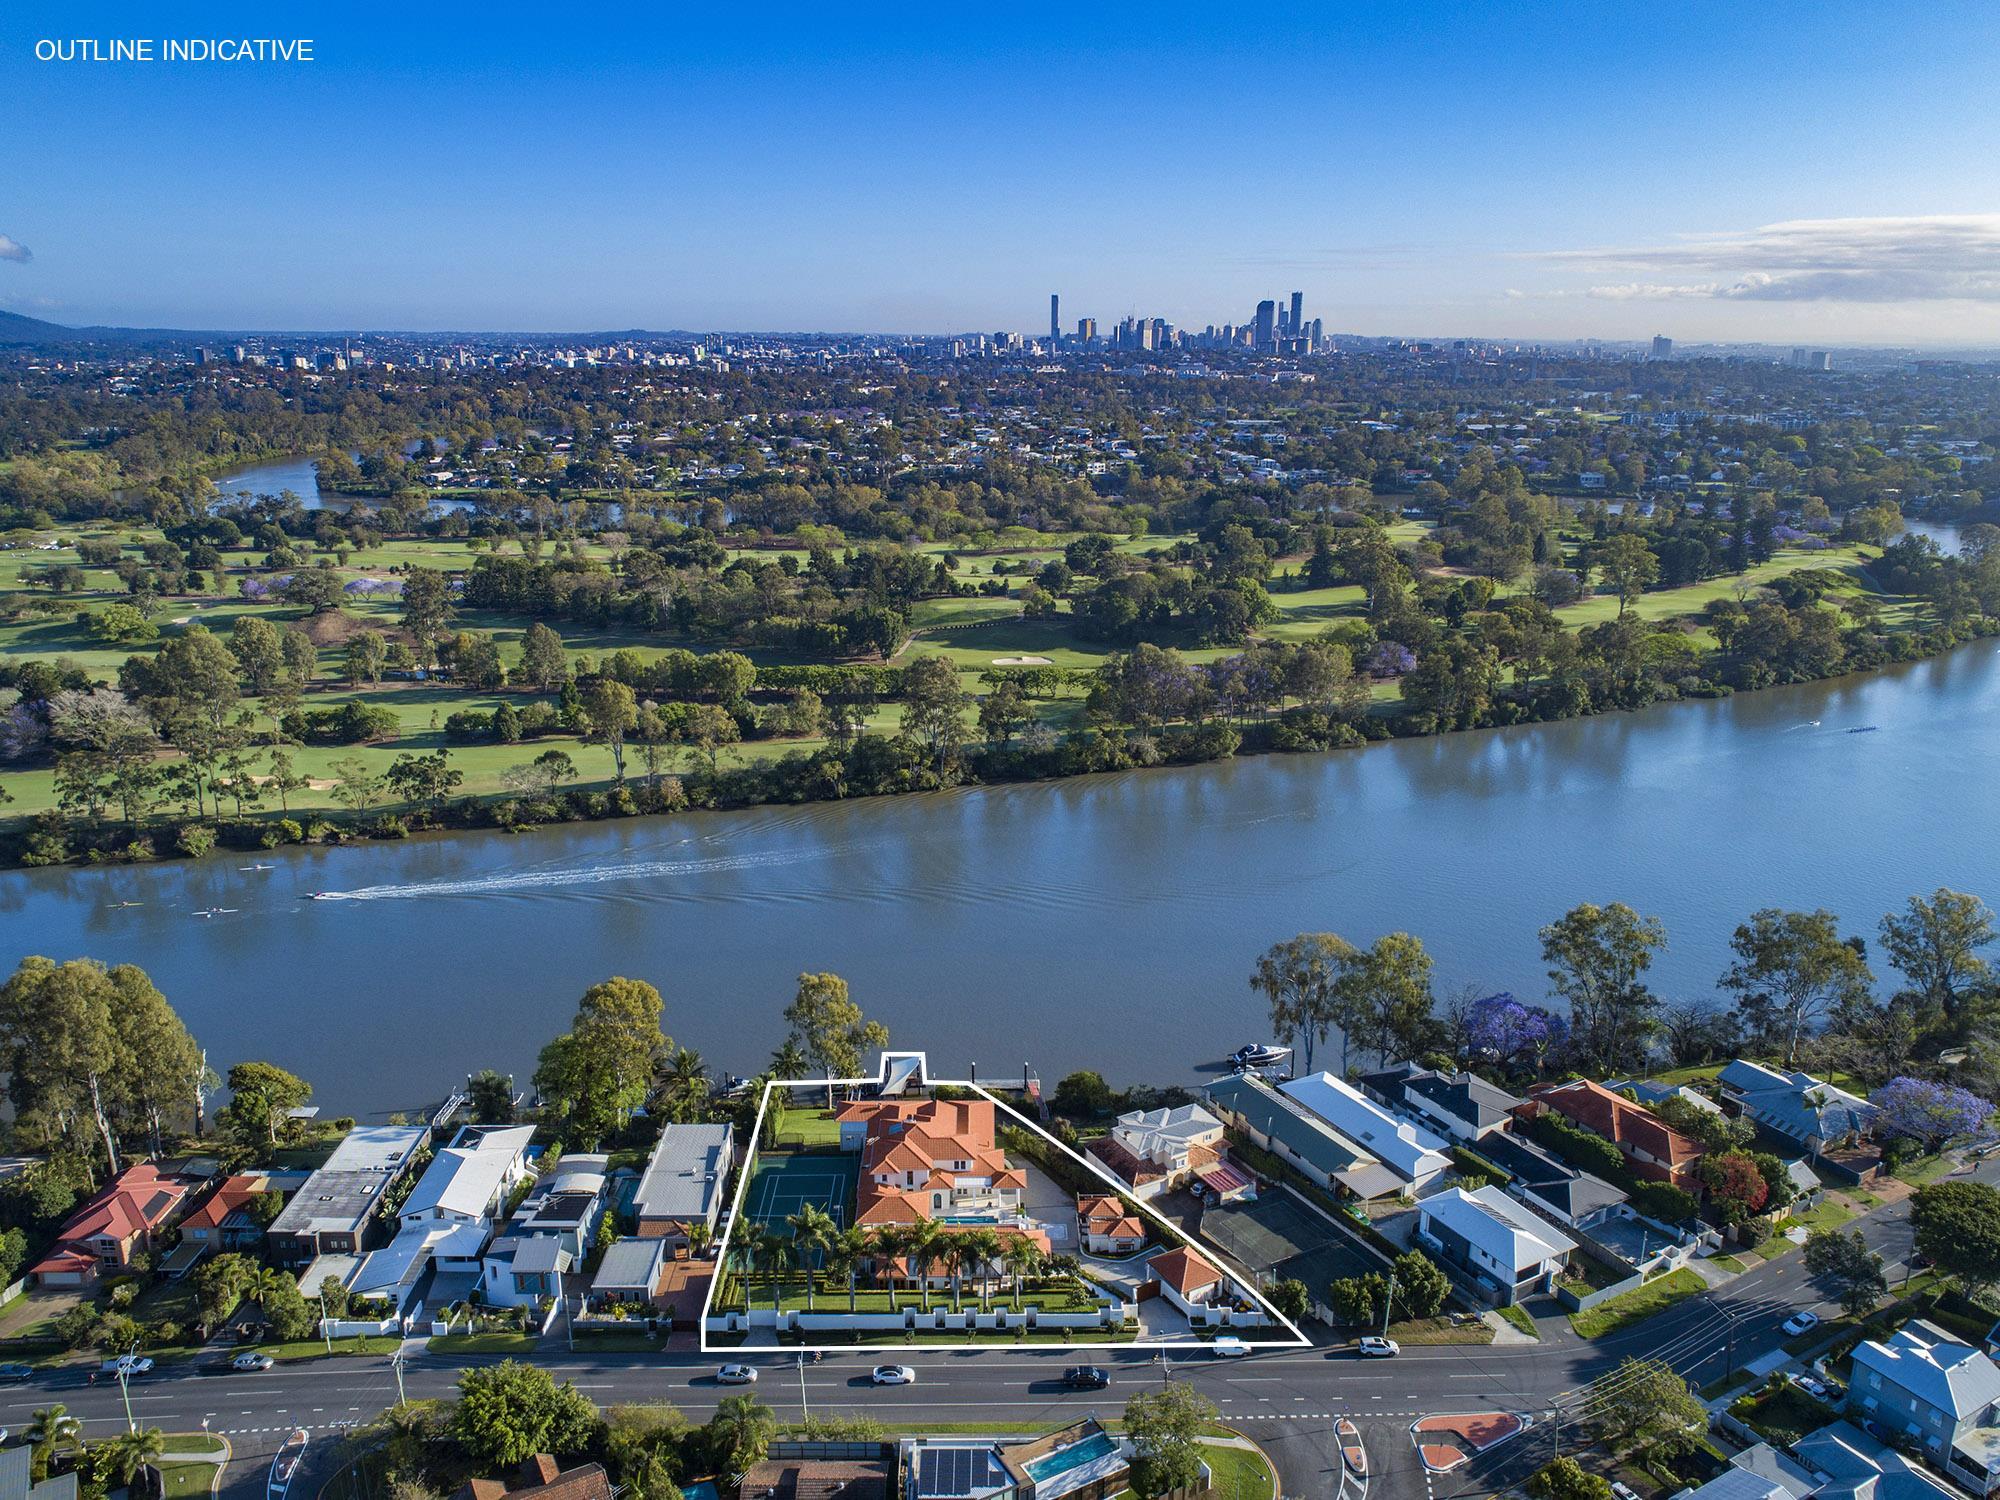 121 King Arthur Terrace, Tennyson, QLD 4105, Sale & Rental ...